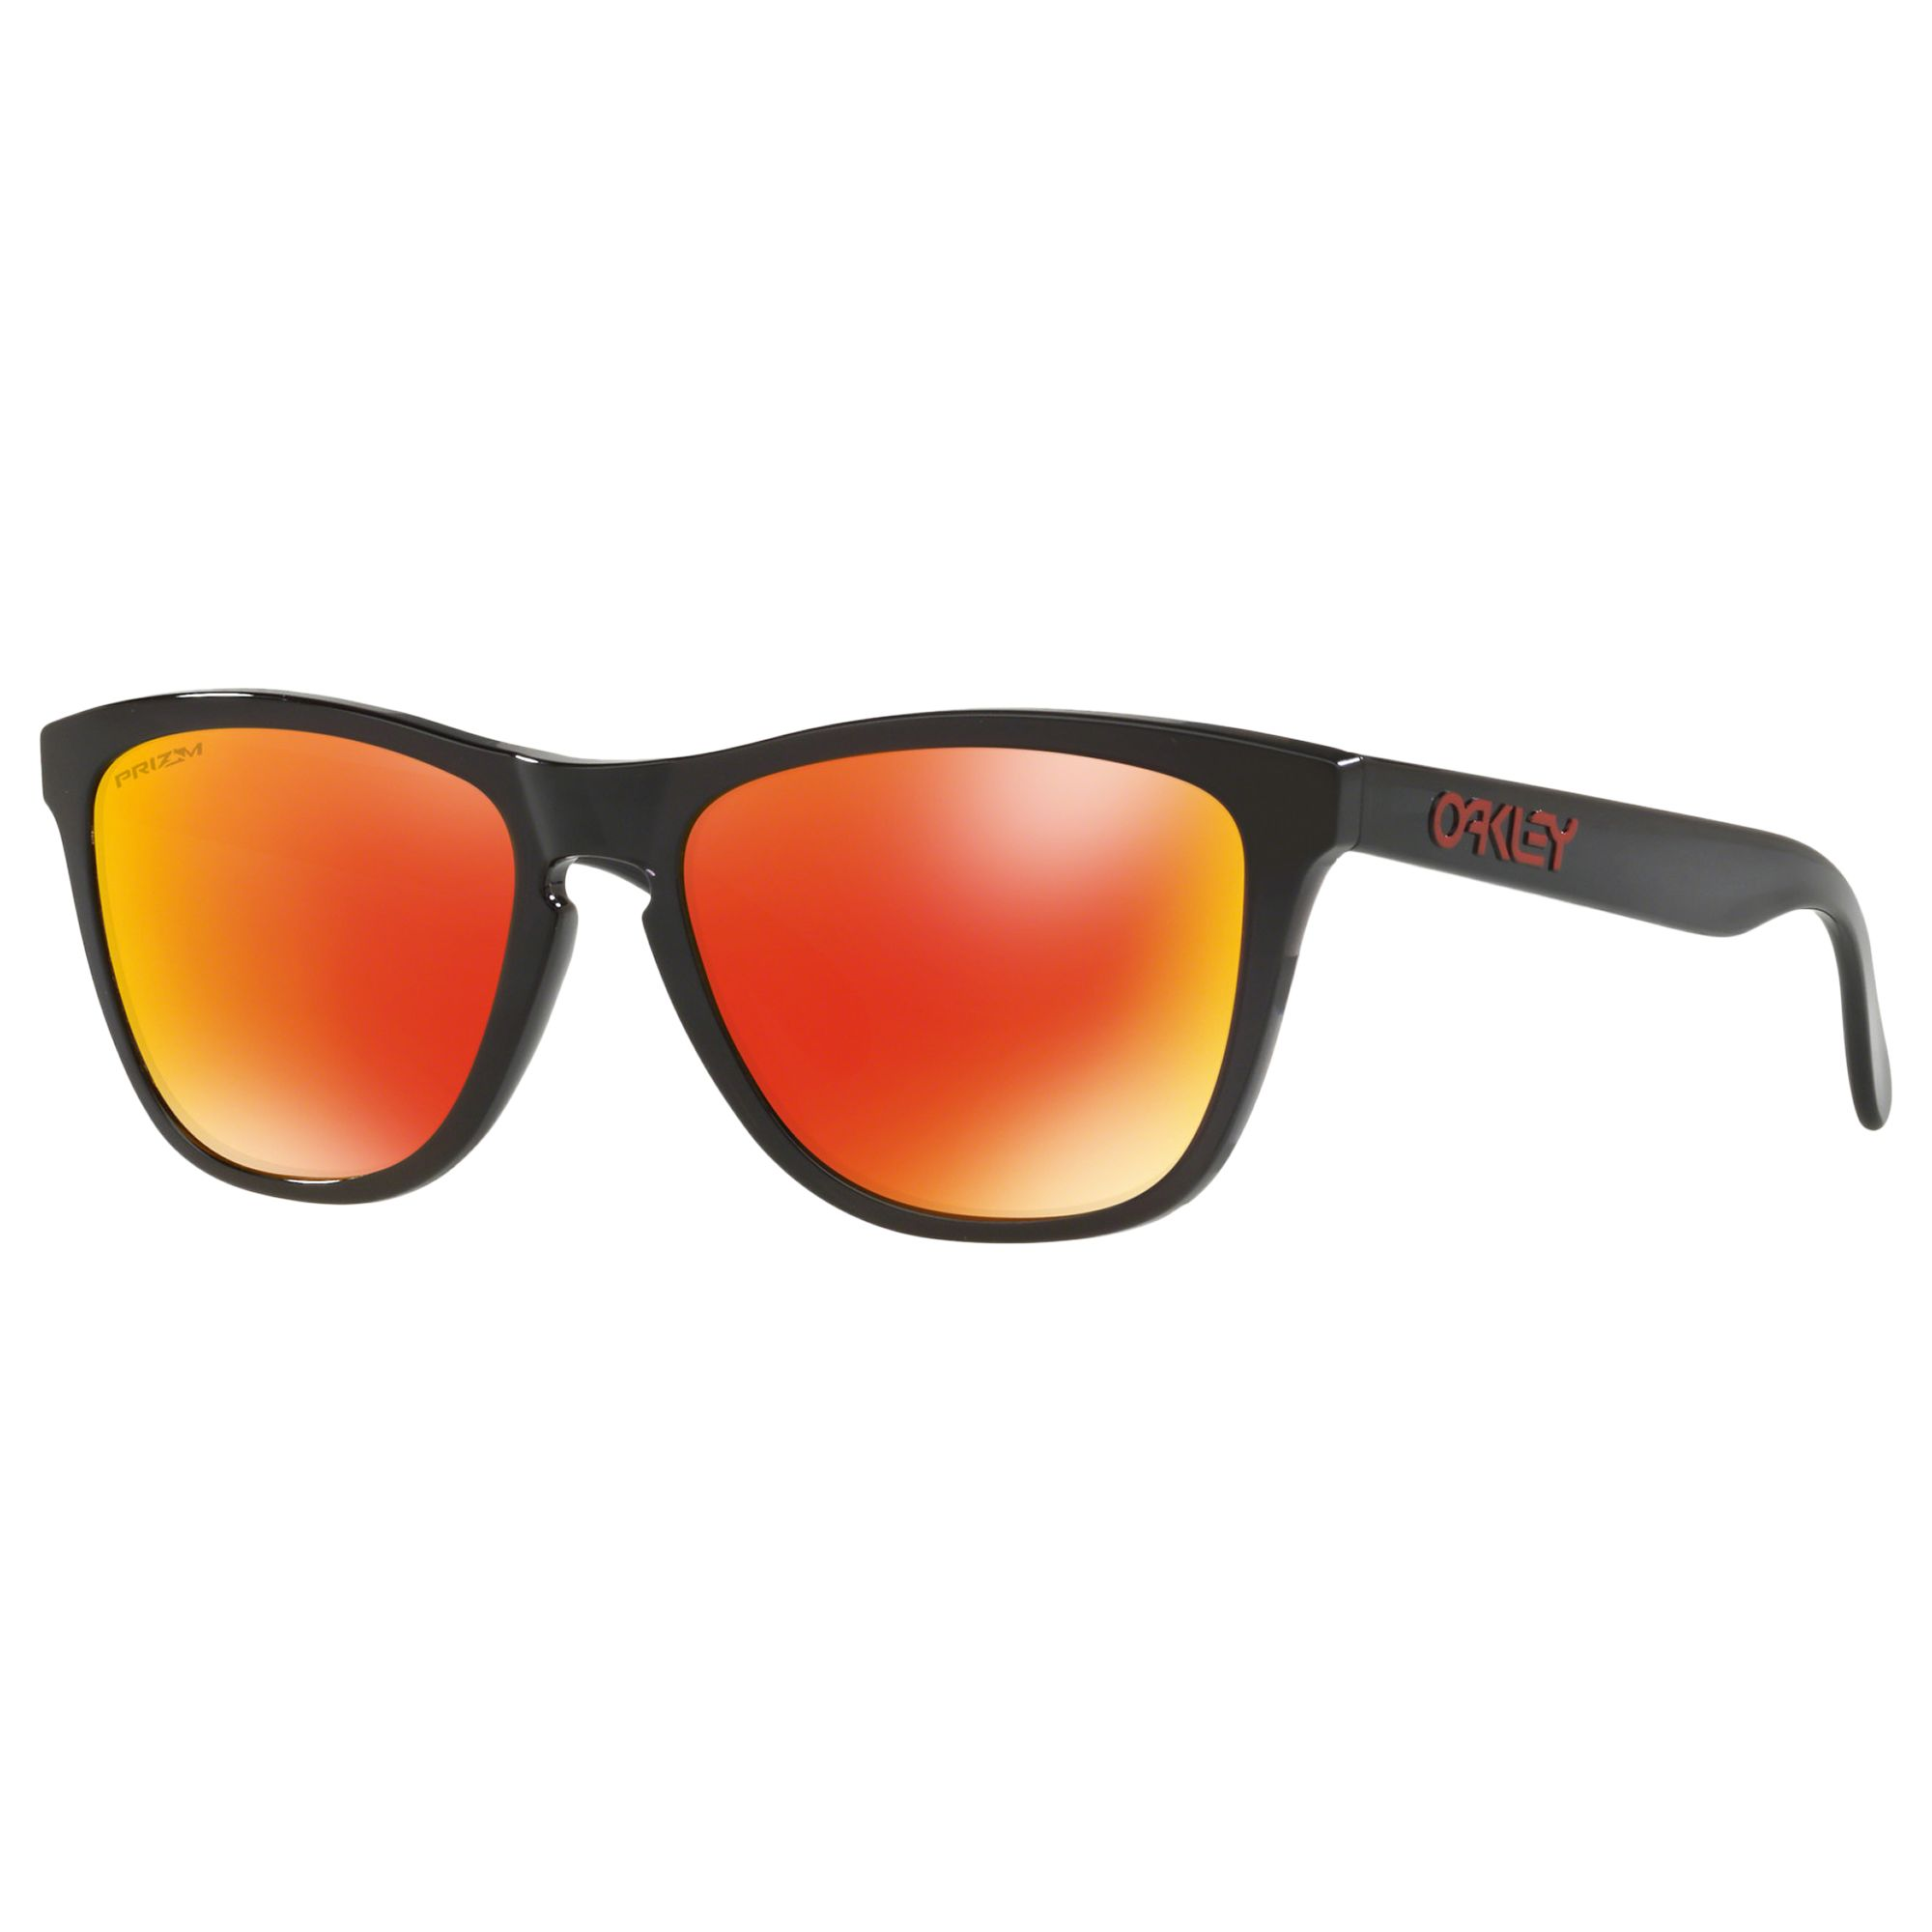 Ruby Wedding Gifts John Lewis: Oakley OO9013 Men's Frogskins Prizm Square Sunglasses